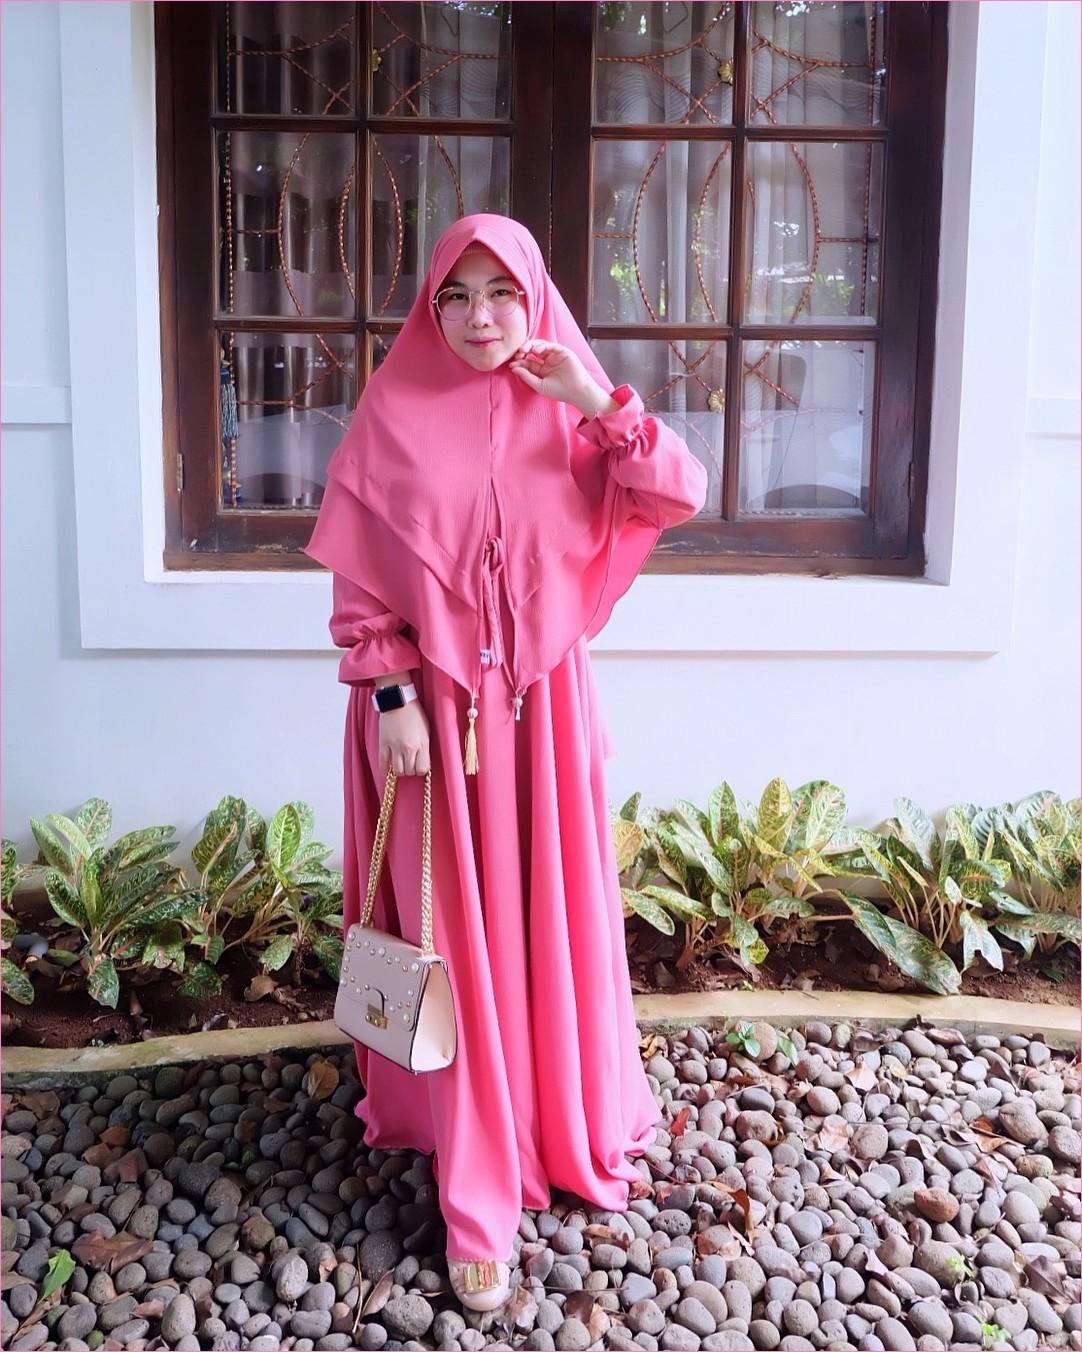 Outfit Baju Gamis Berhijab Ala Selebgram 2018 gamis abaya pink tua hijab kerudung syar'i high heels flatshoes loafers and slip ons krem muda ciput rajut trendy terbaru 2018 ootd outfit selebgram jam tangan hitam slingbags